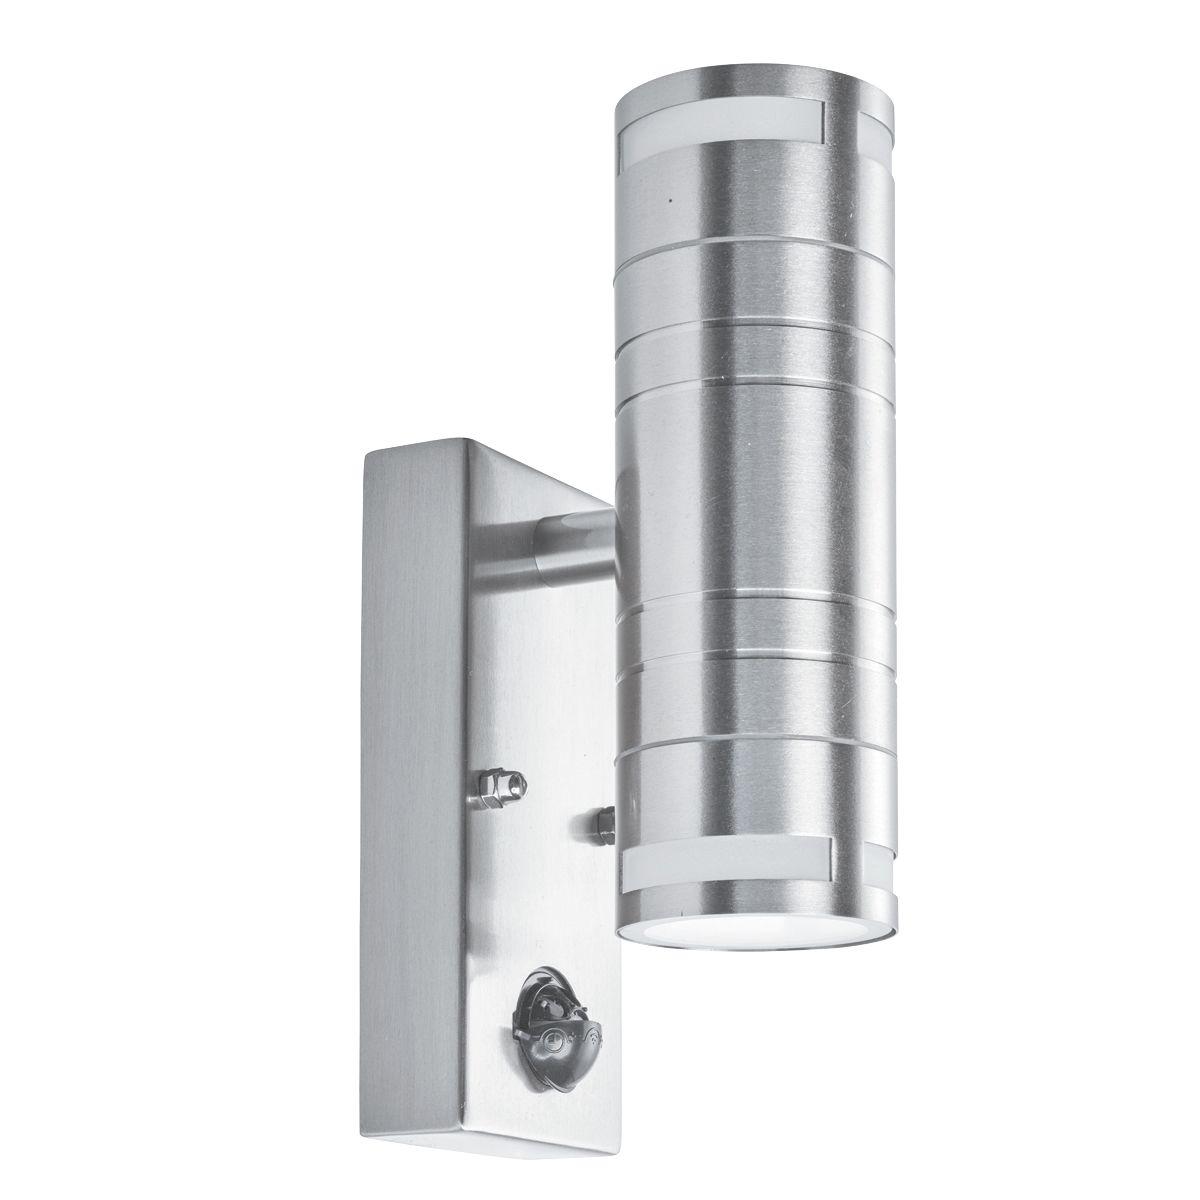 Ip44 Outdoor 2 Light Wall Light, Stainless Steel, Motion Sensor